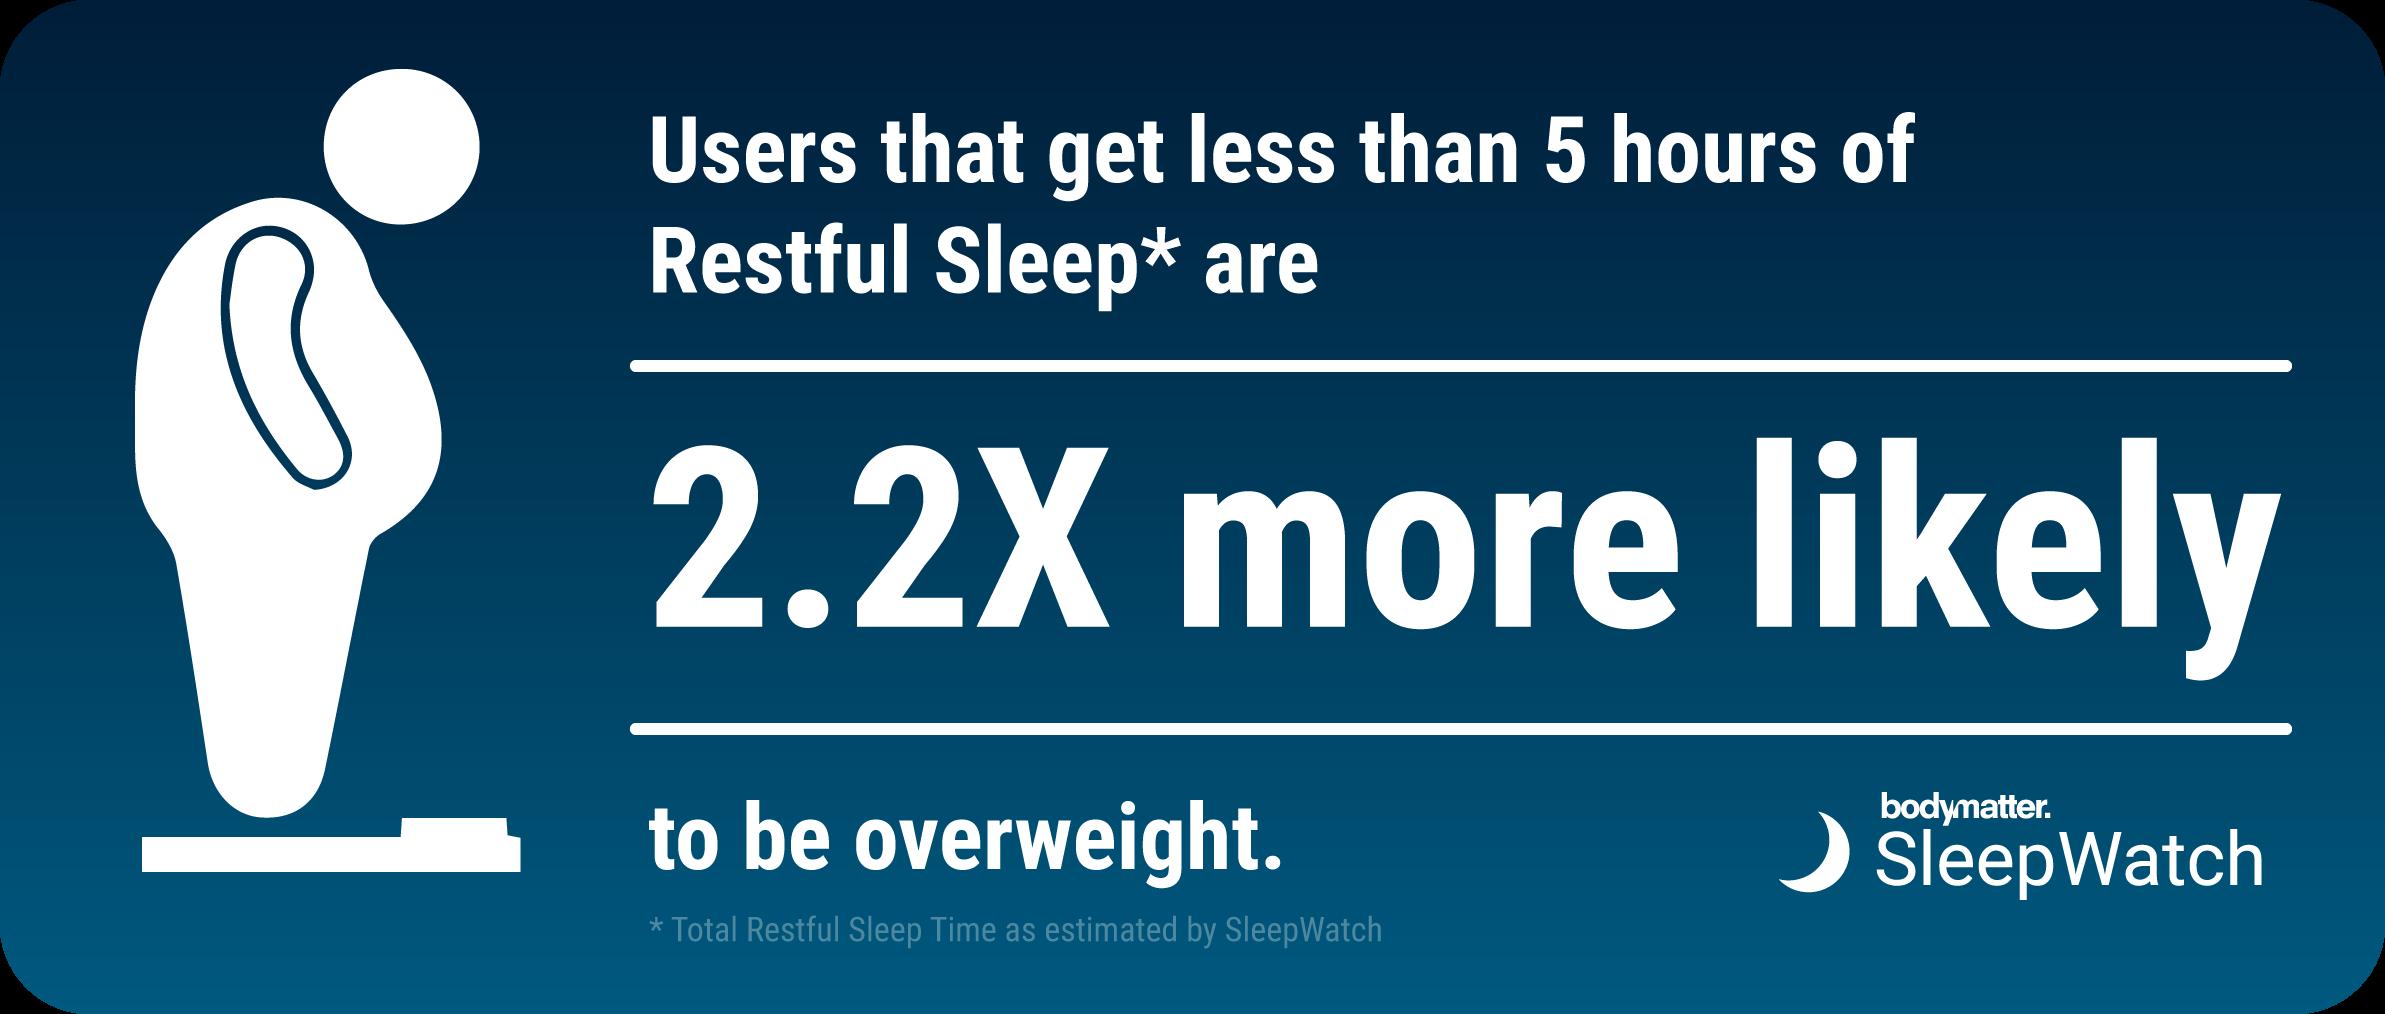 sleepwatch_user_data_restful_sleep_overweight.png